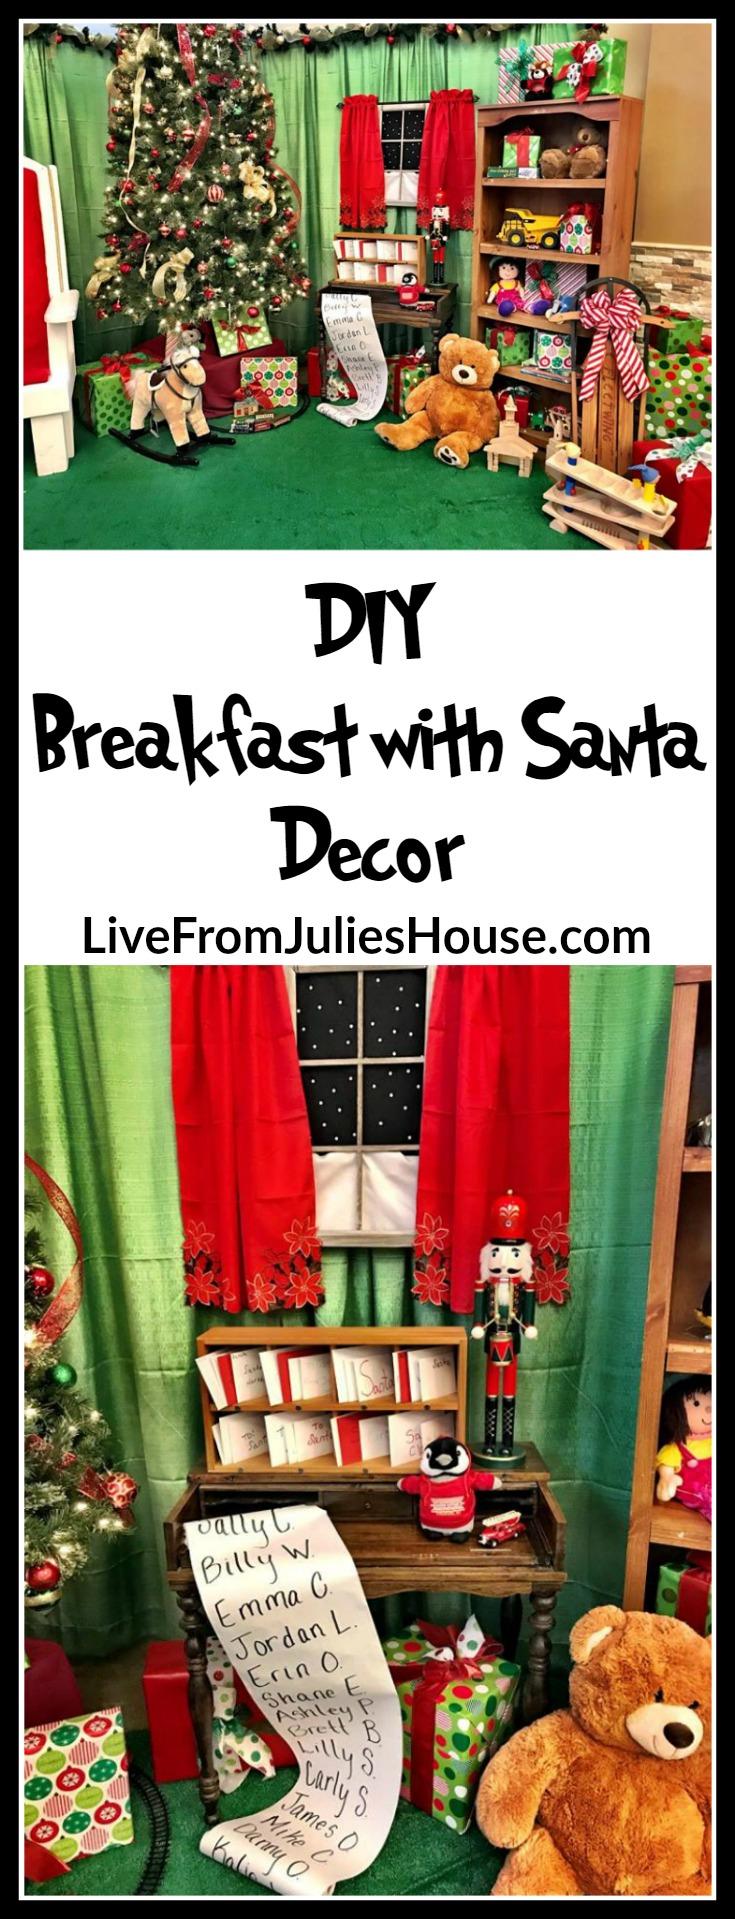 DIY Breakfast with Santa Decor